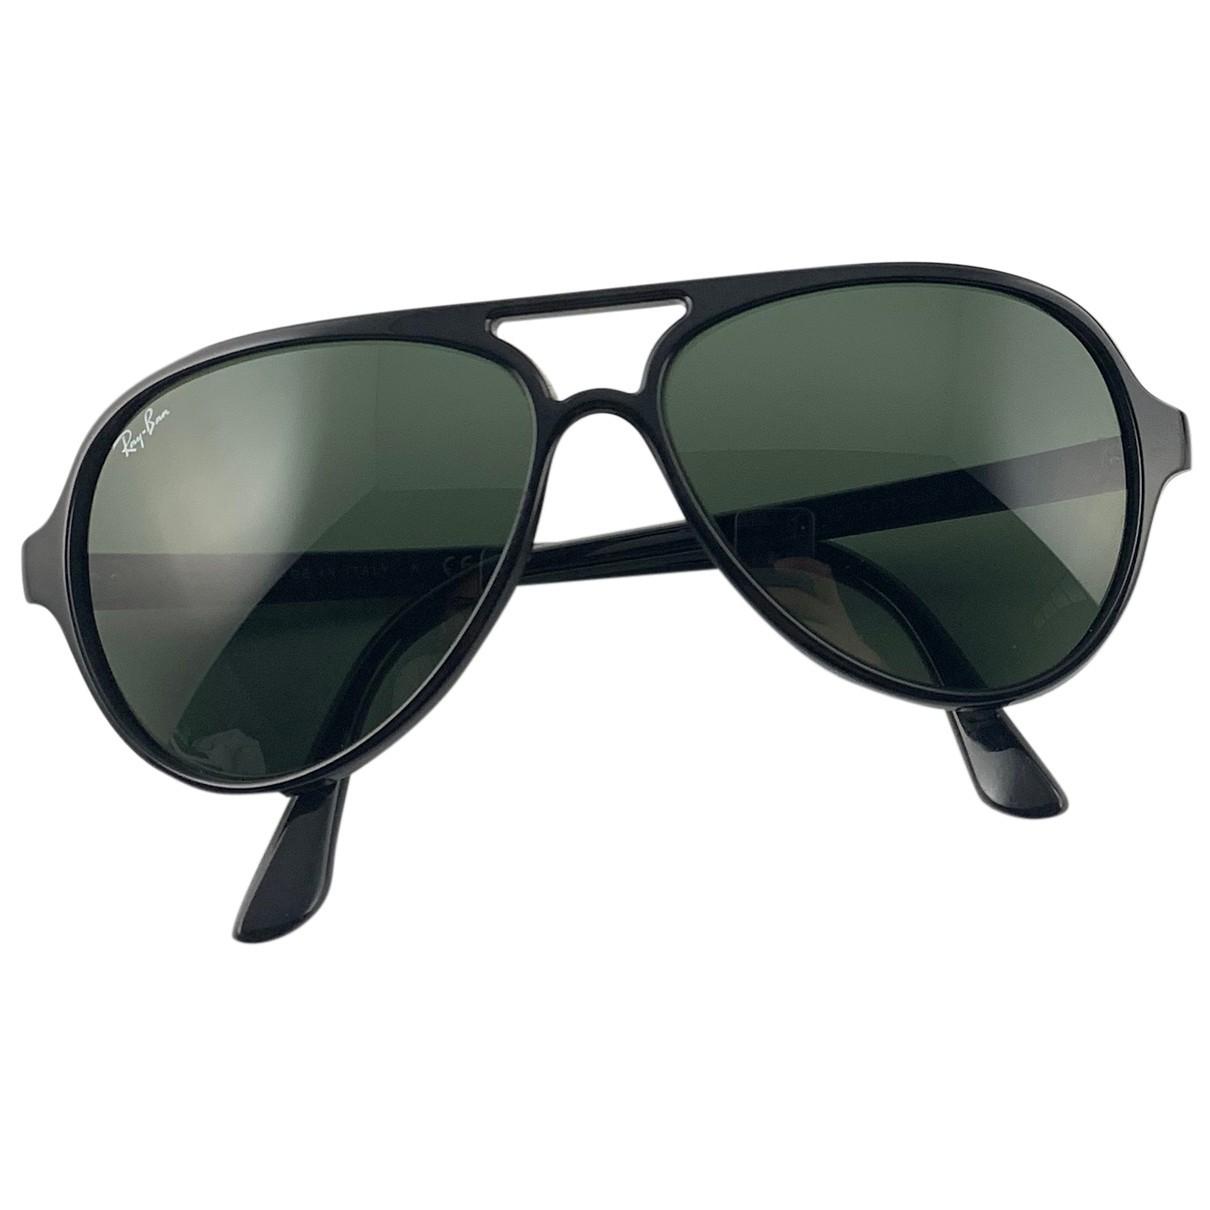 Ray-ban Aviator Black Sunglasses for Women N